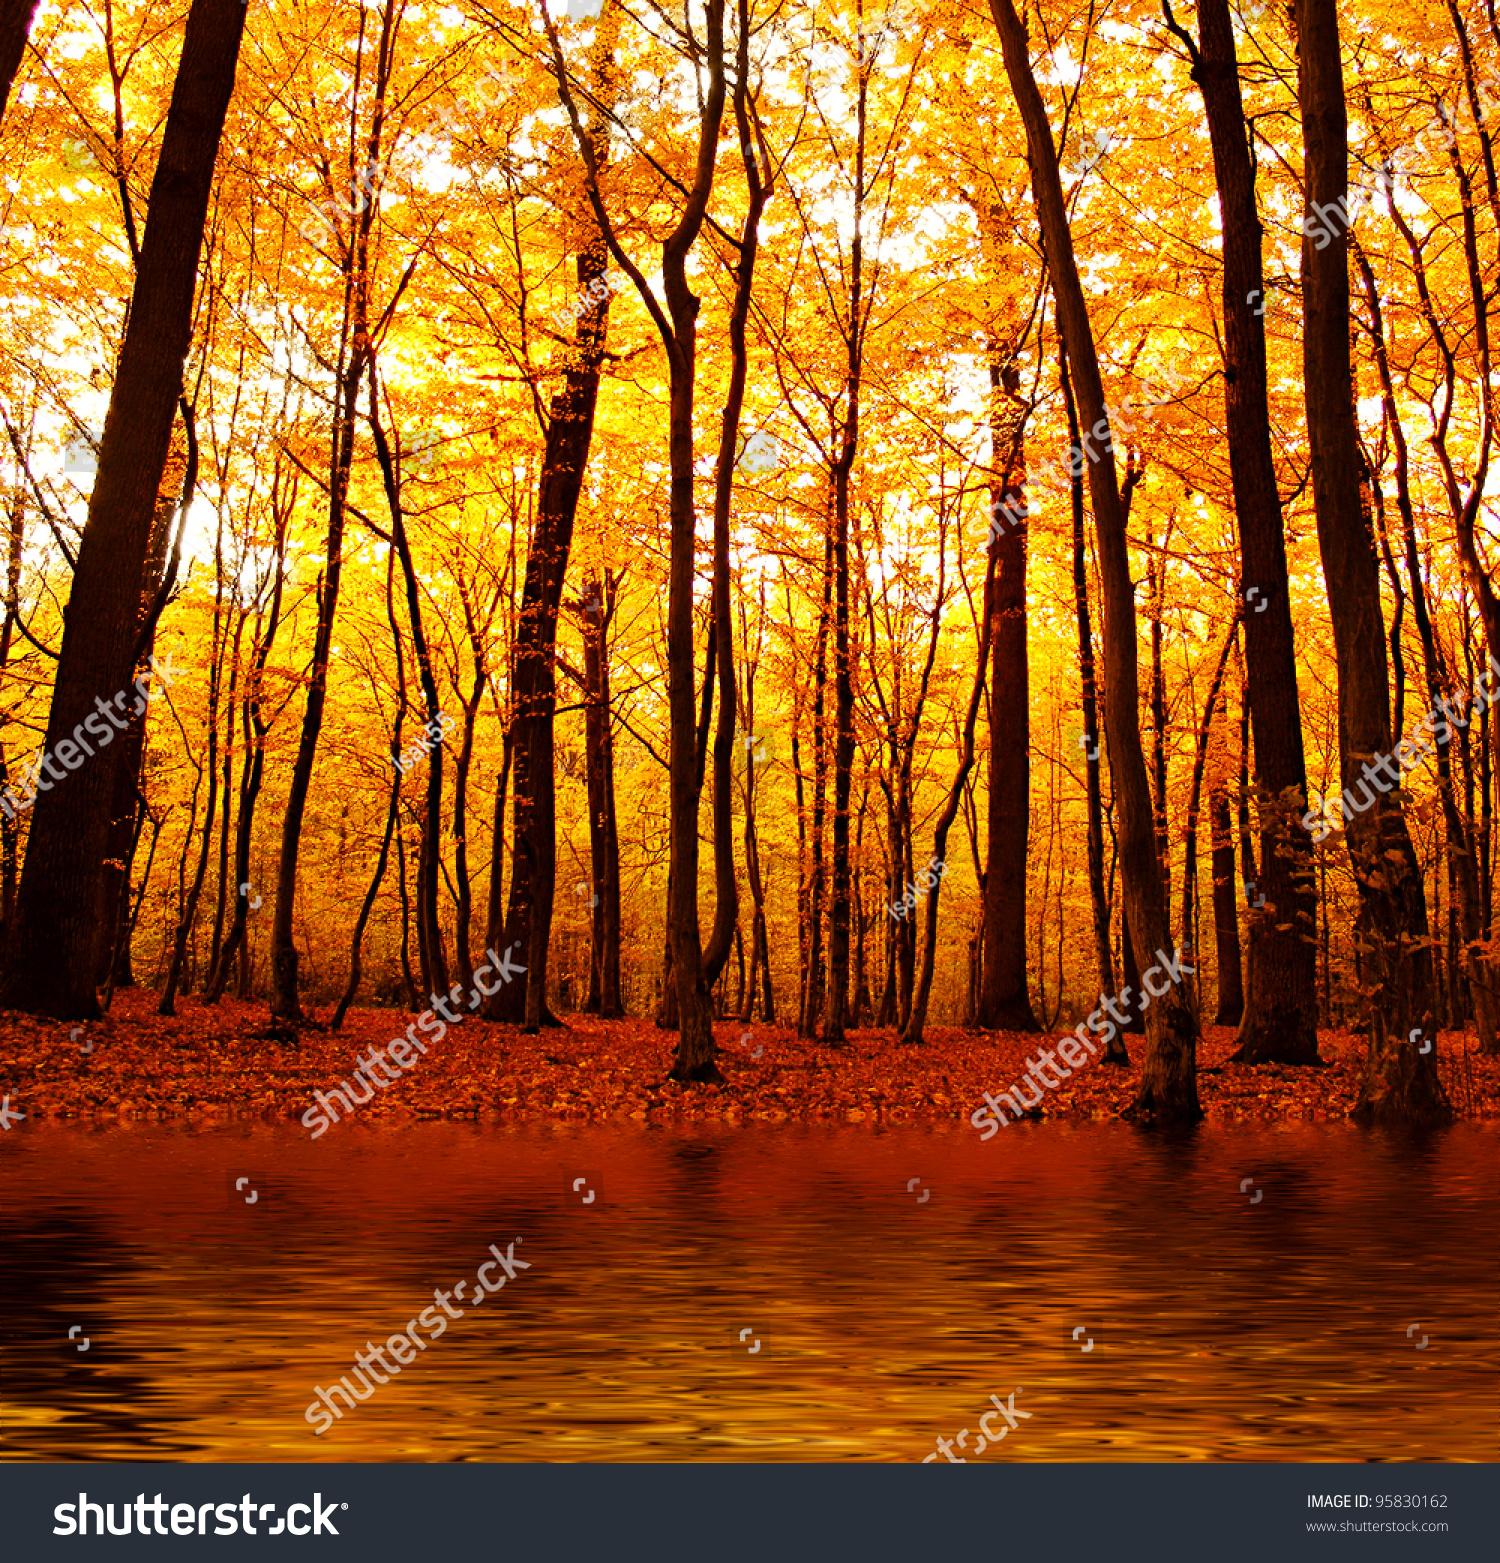 Beautiful Nature House: Lake Autumn Forest Beautiful Nature Background Stock Photo